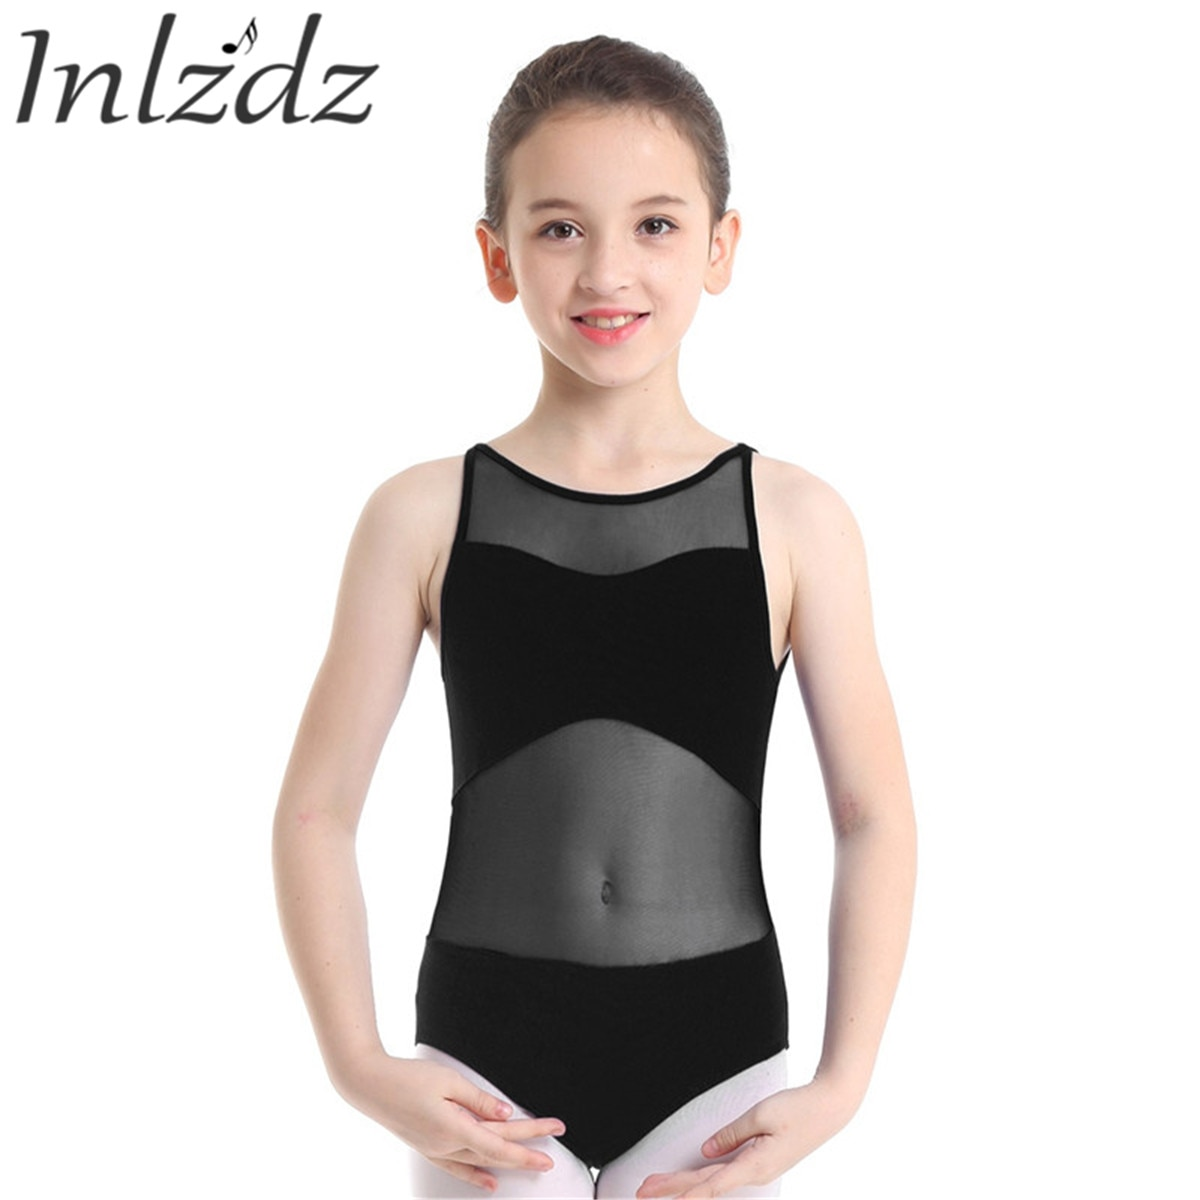 Leotardo de Ballet para niños niñas, traje de baño de gimnasia para bailar, traje de baño Bodi transparente de malla, bailarina, tutú, leotardo, Ropa de baile